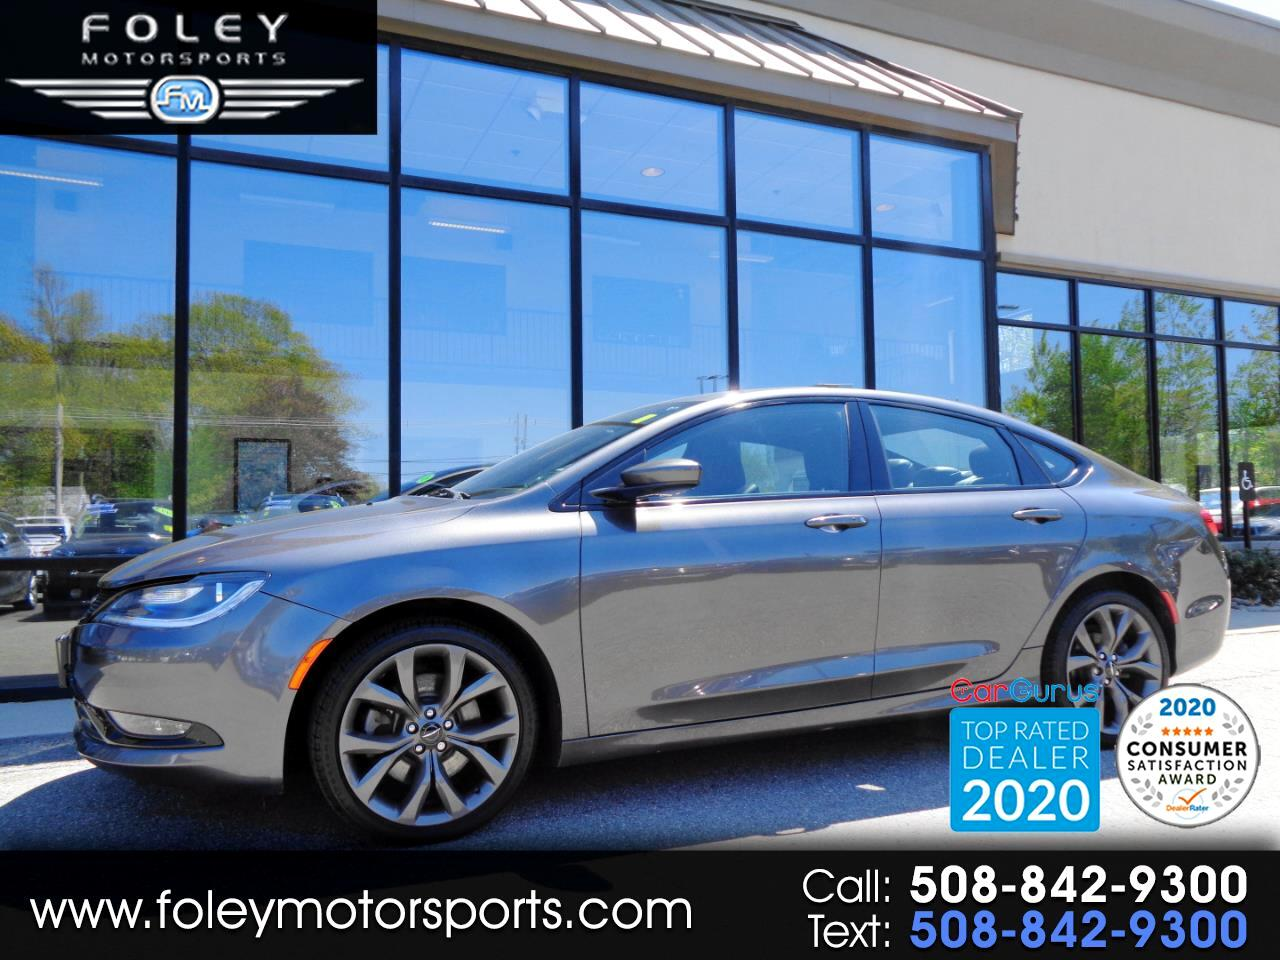 Chrysler 200 4dr Sdn S AWD 2015